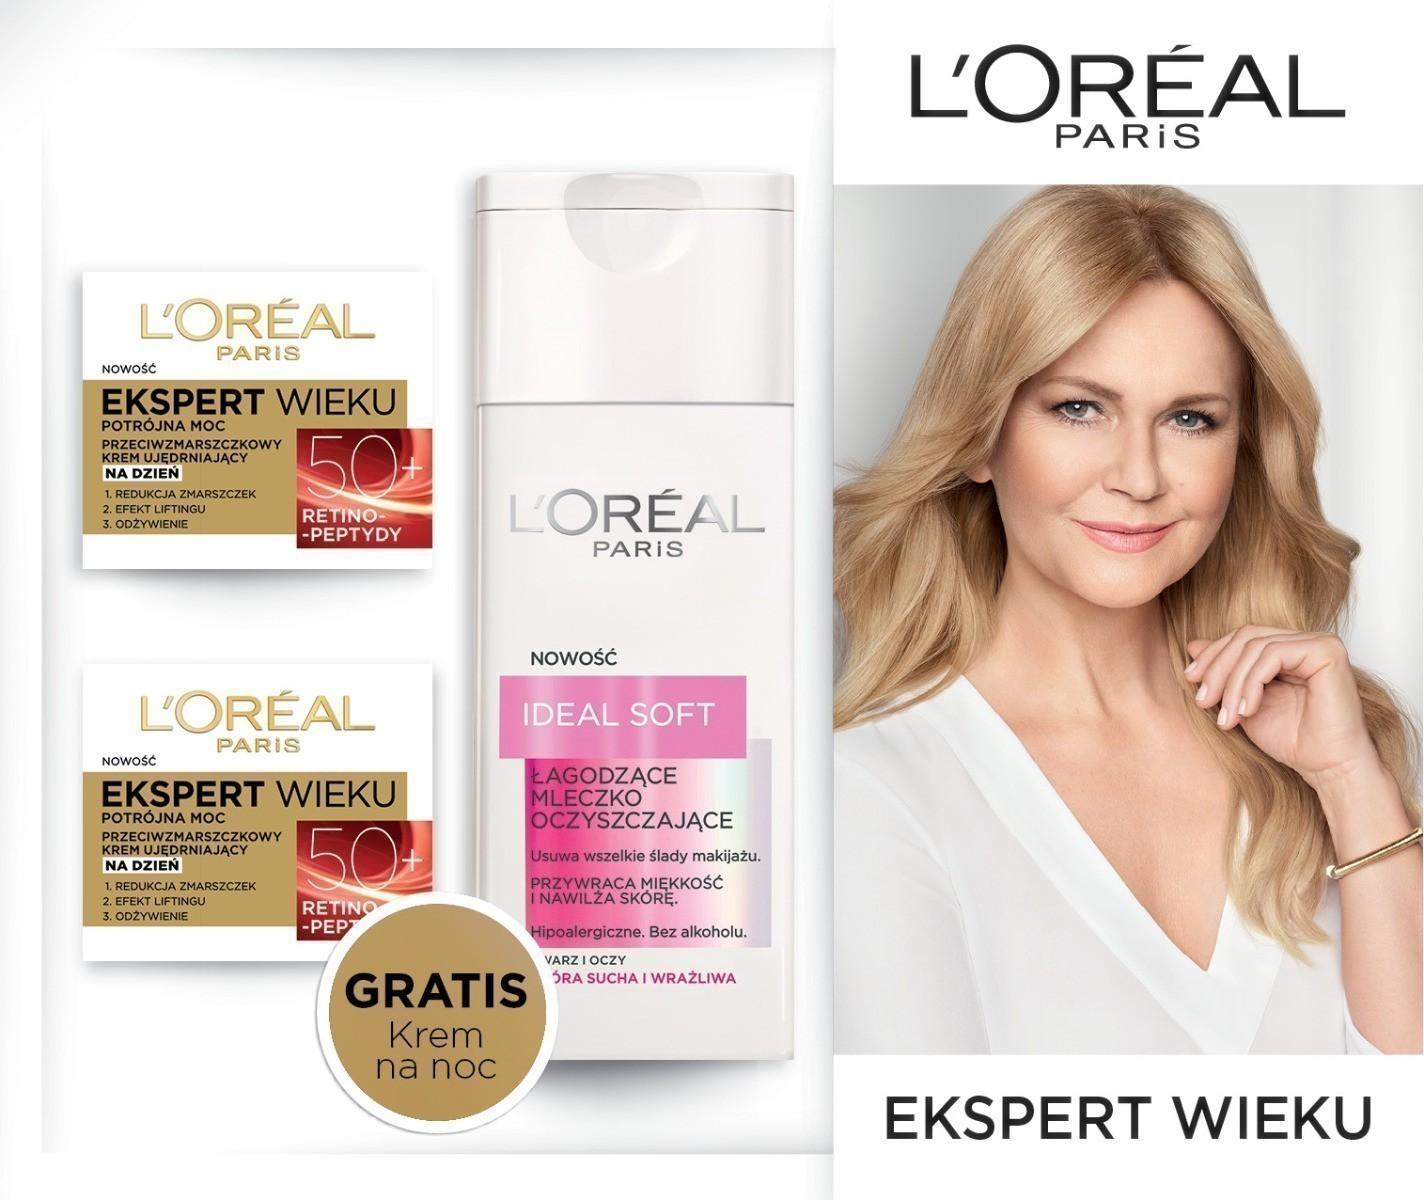 L'Oréal Ekspert Wieku 50+ XMASS